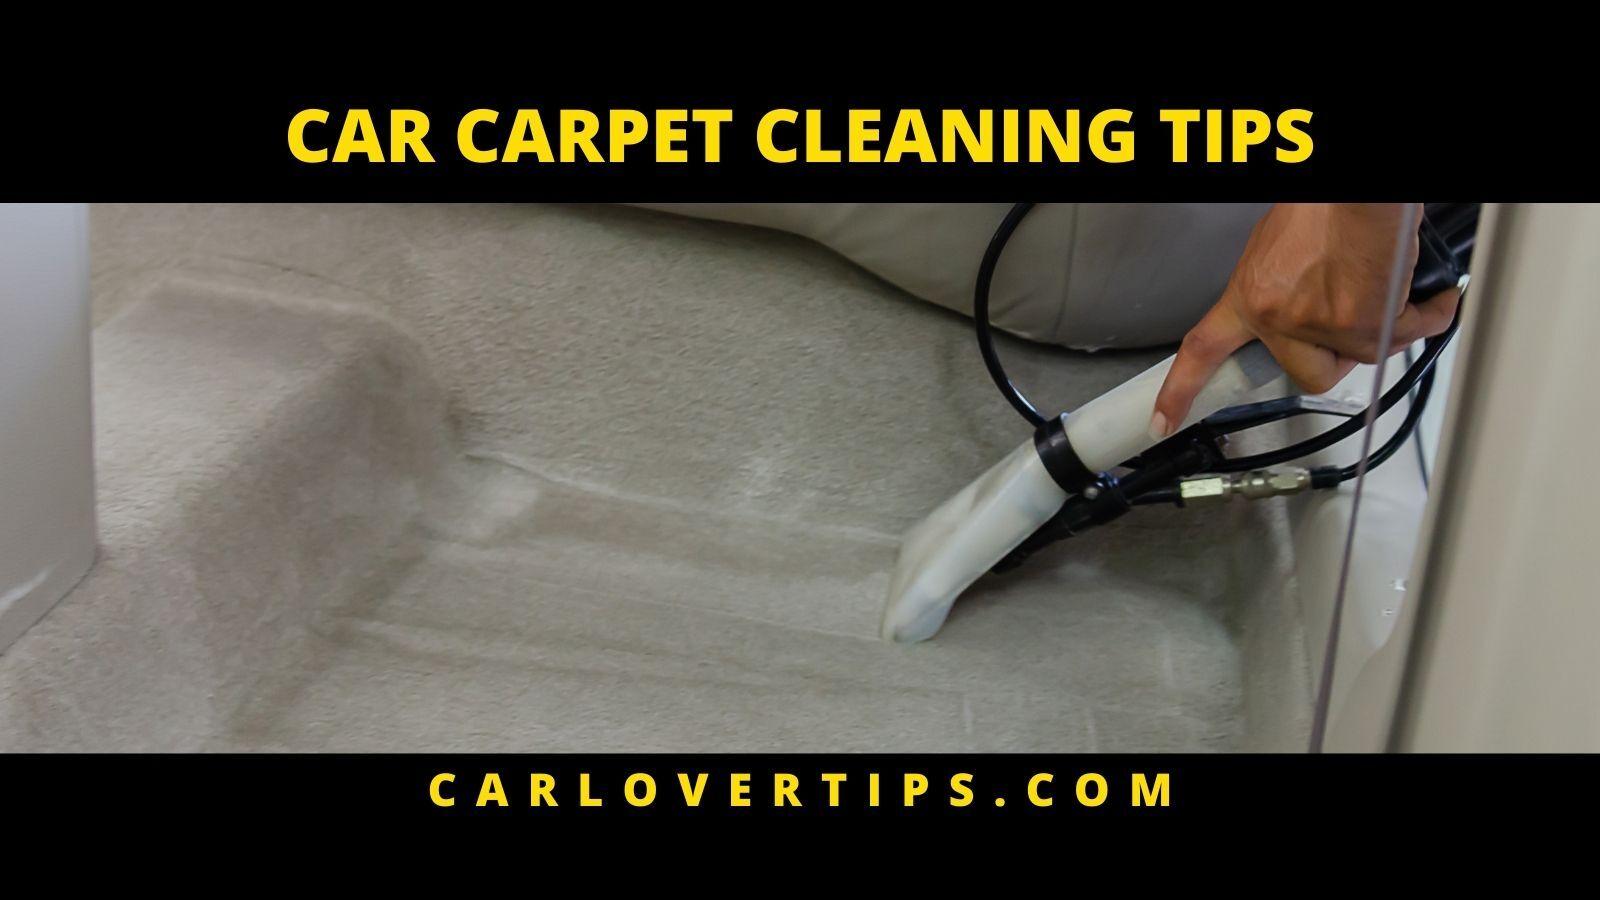 Best Car Carpet Cleaner Tips Car Lover Tips CAR